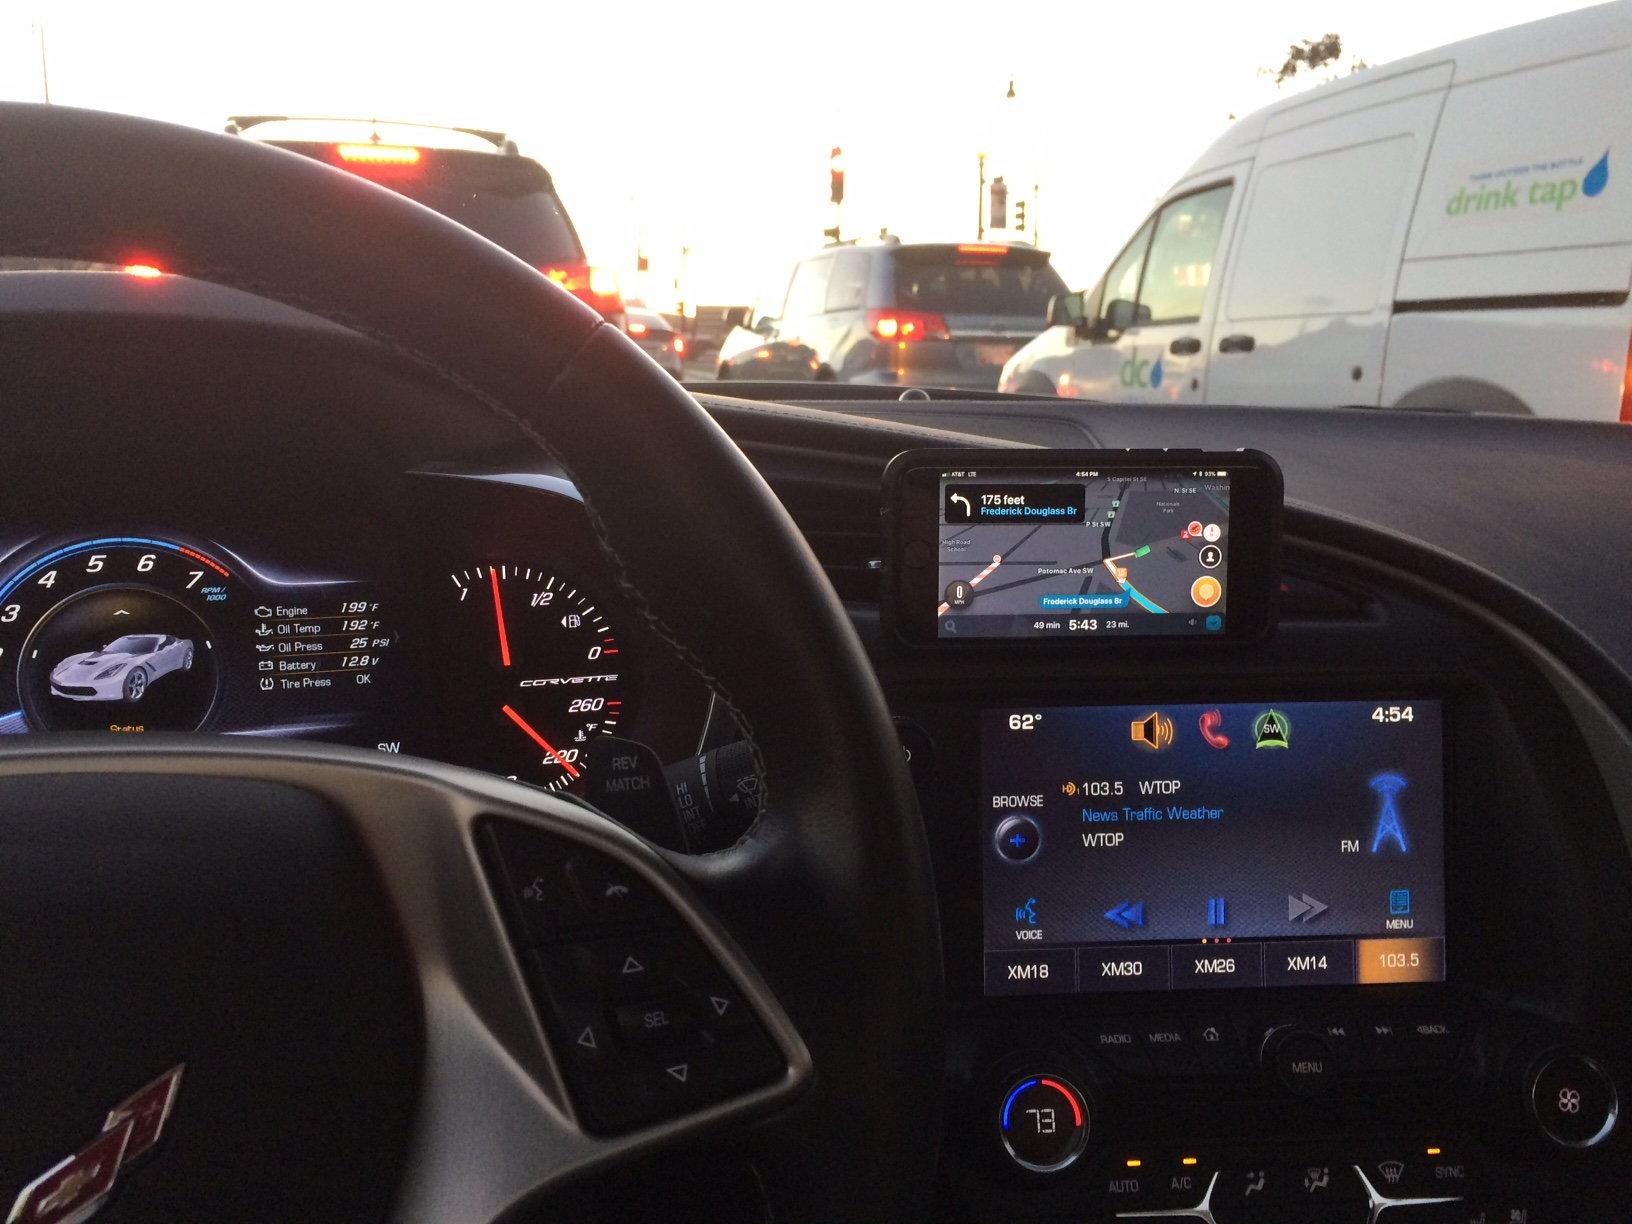 Apple CarPlay problem - CorvetteForum - Chevrolet Corvette Forum